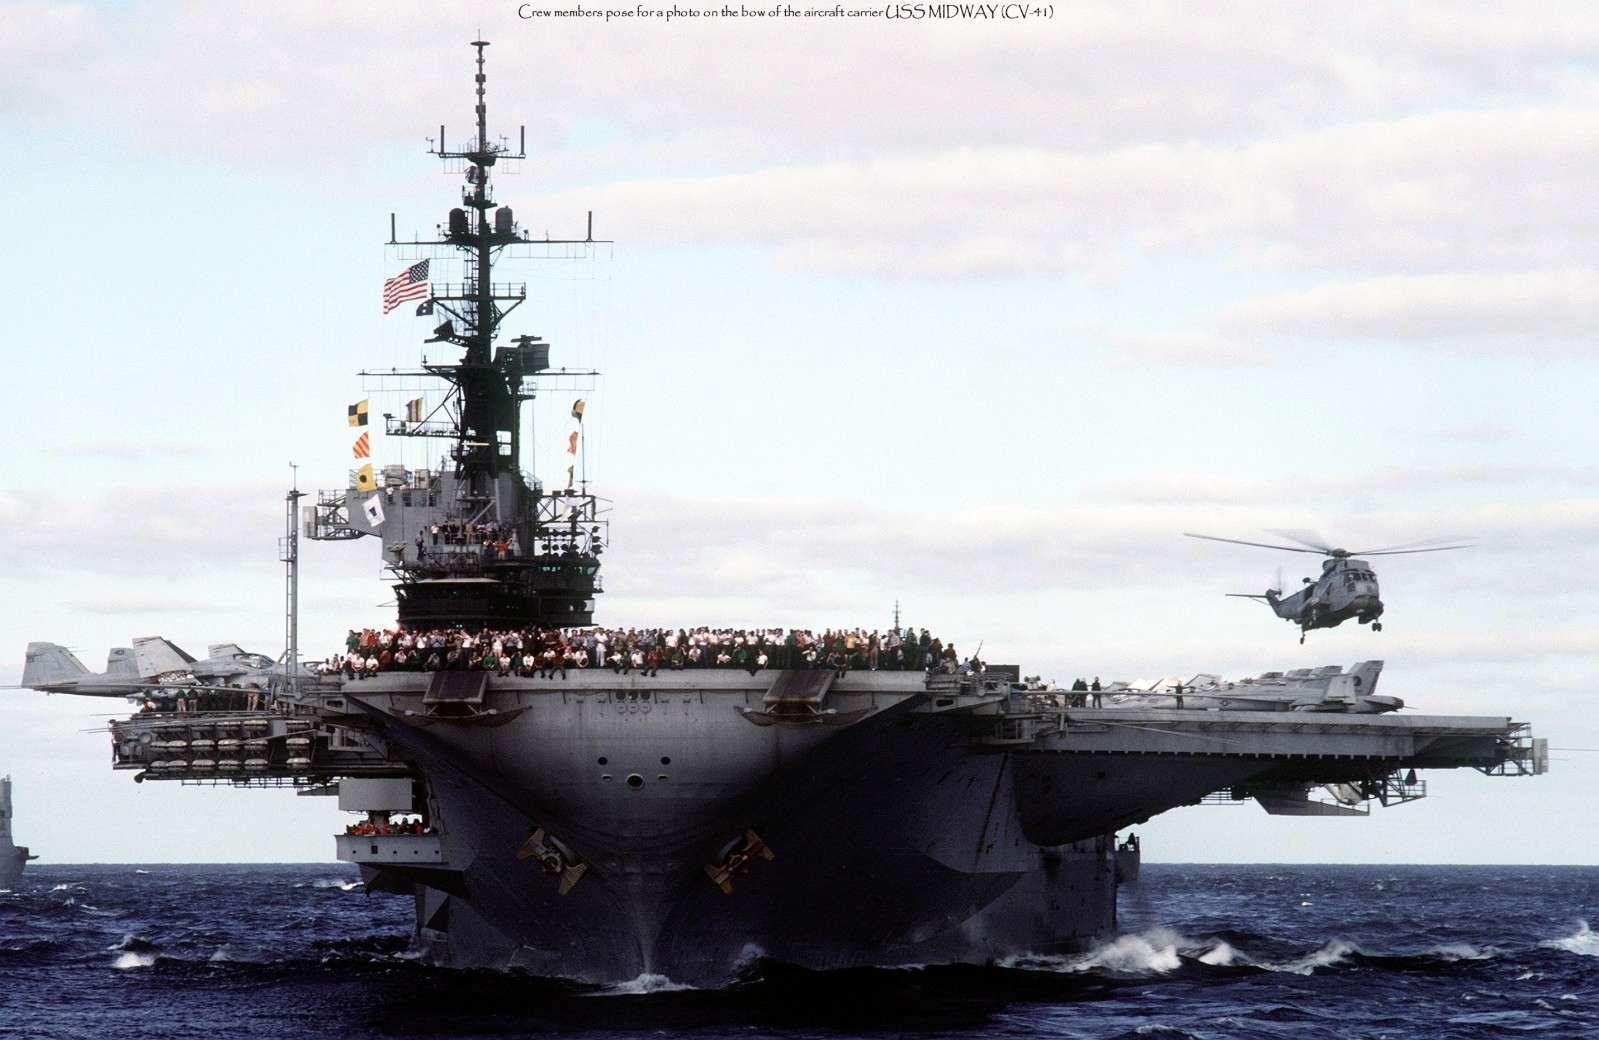 [USS Midway CVA-41] Porte avions lourd américain-700e-Orange Hobby - Page 2 2dipzj10